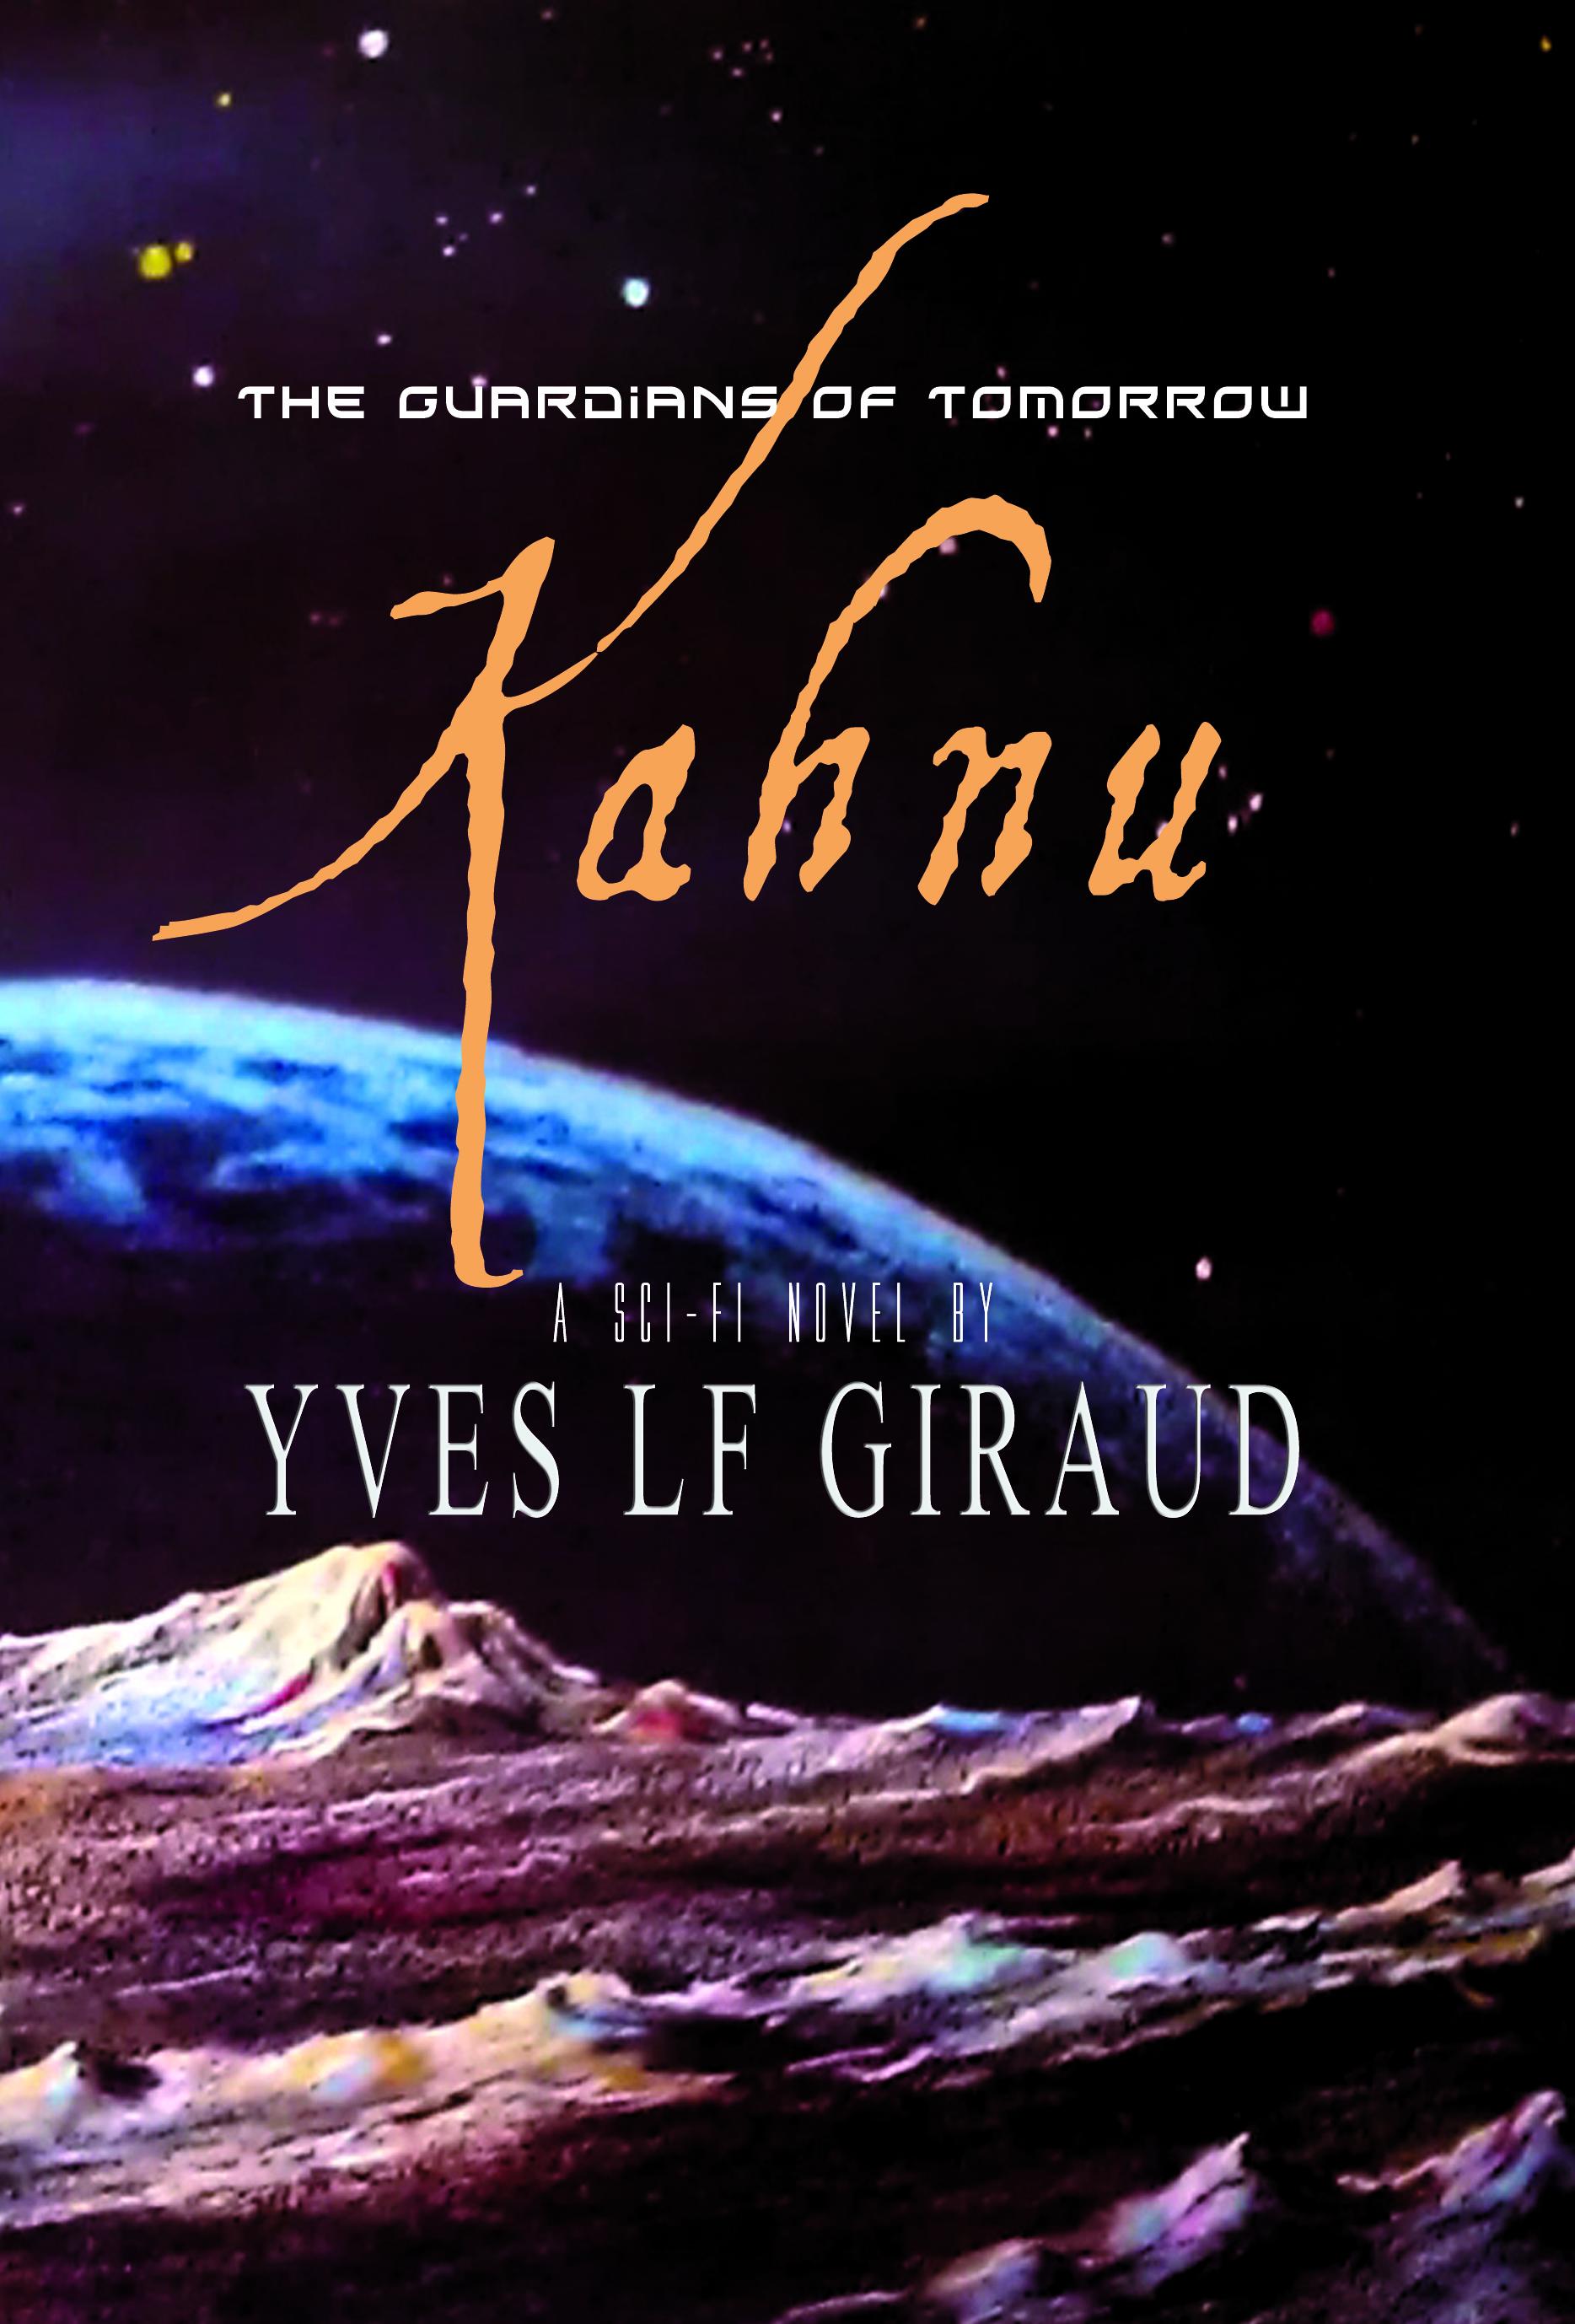 Kahnu book cover - Yves Giraud - 6X9 - Front Flat 1.jpg